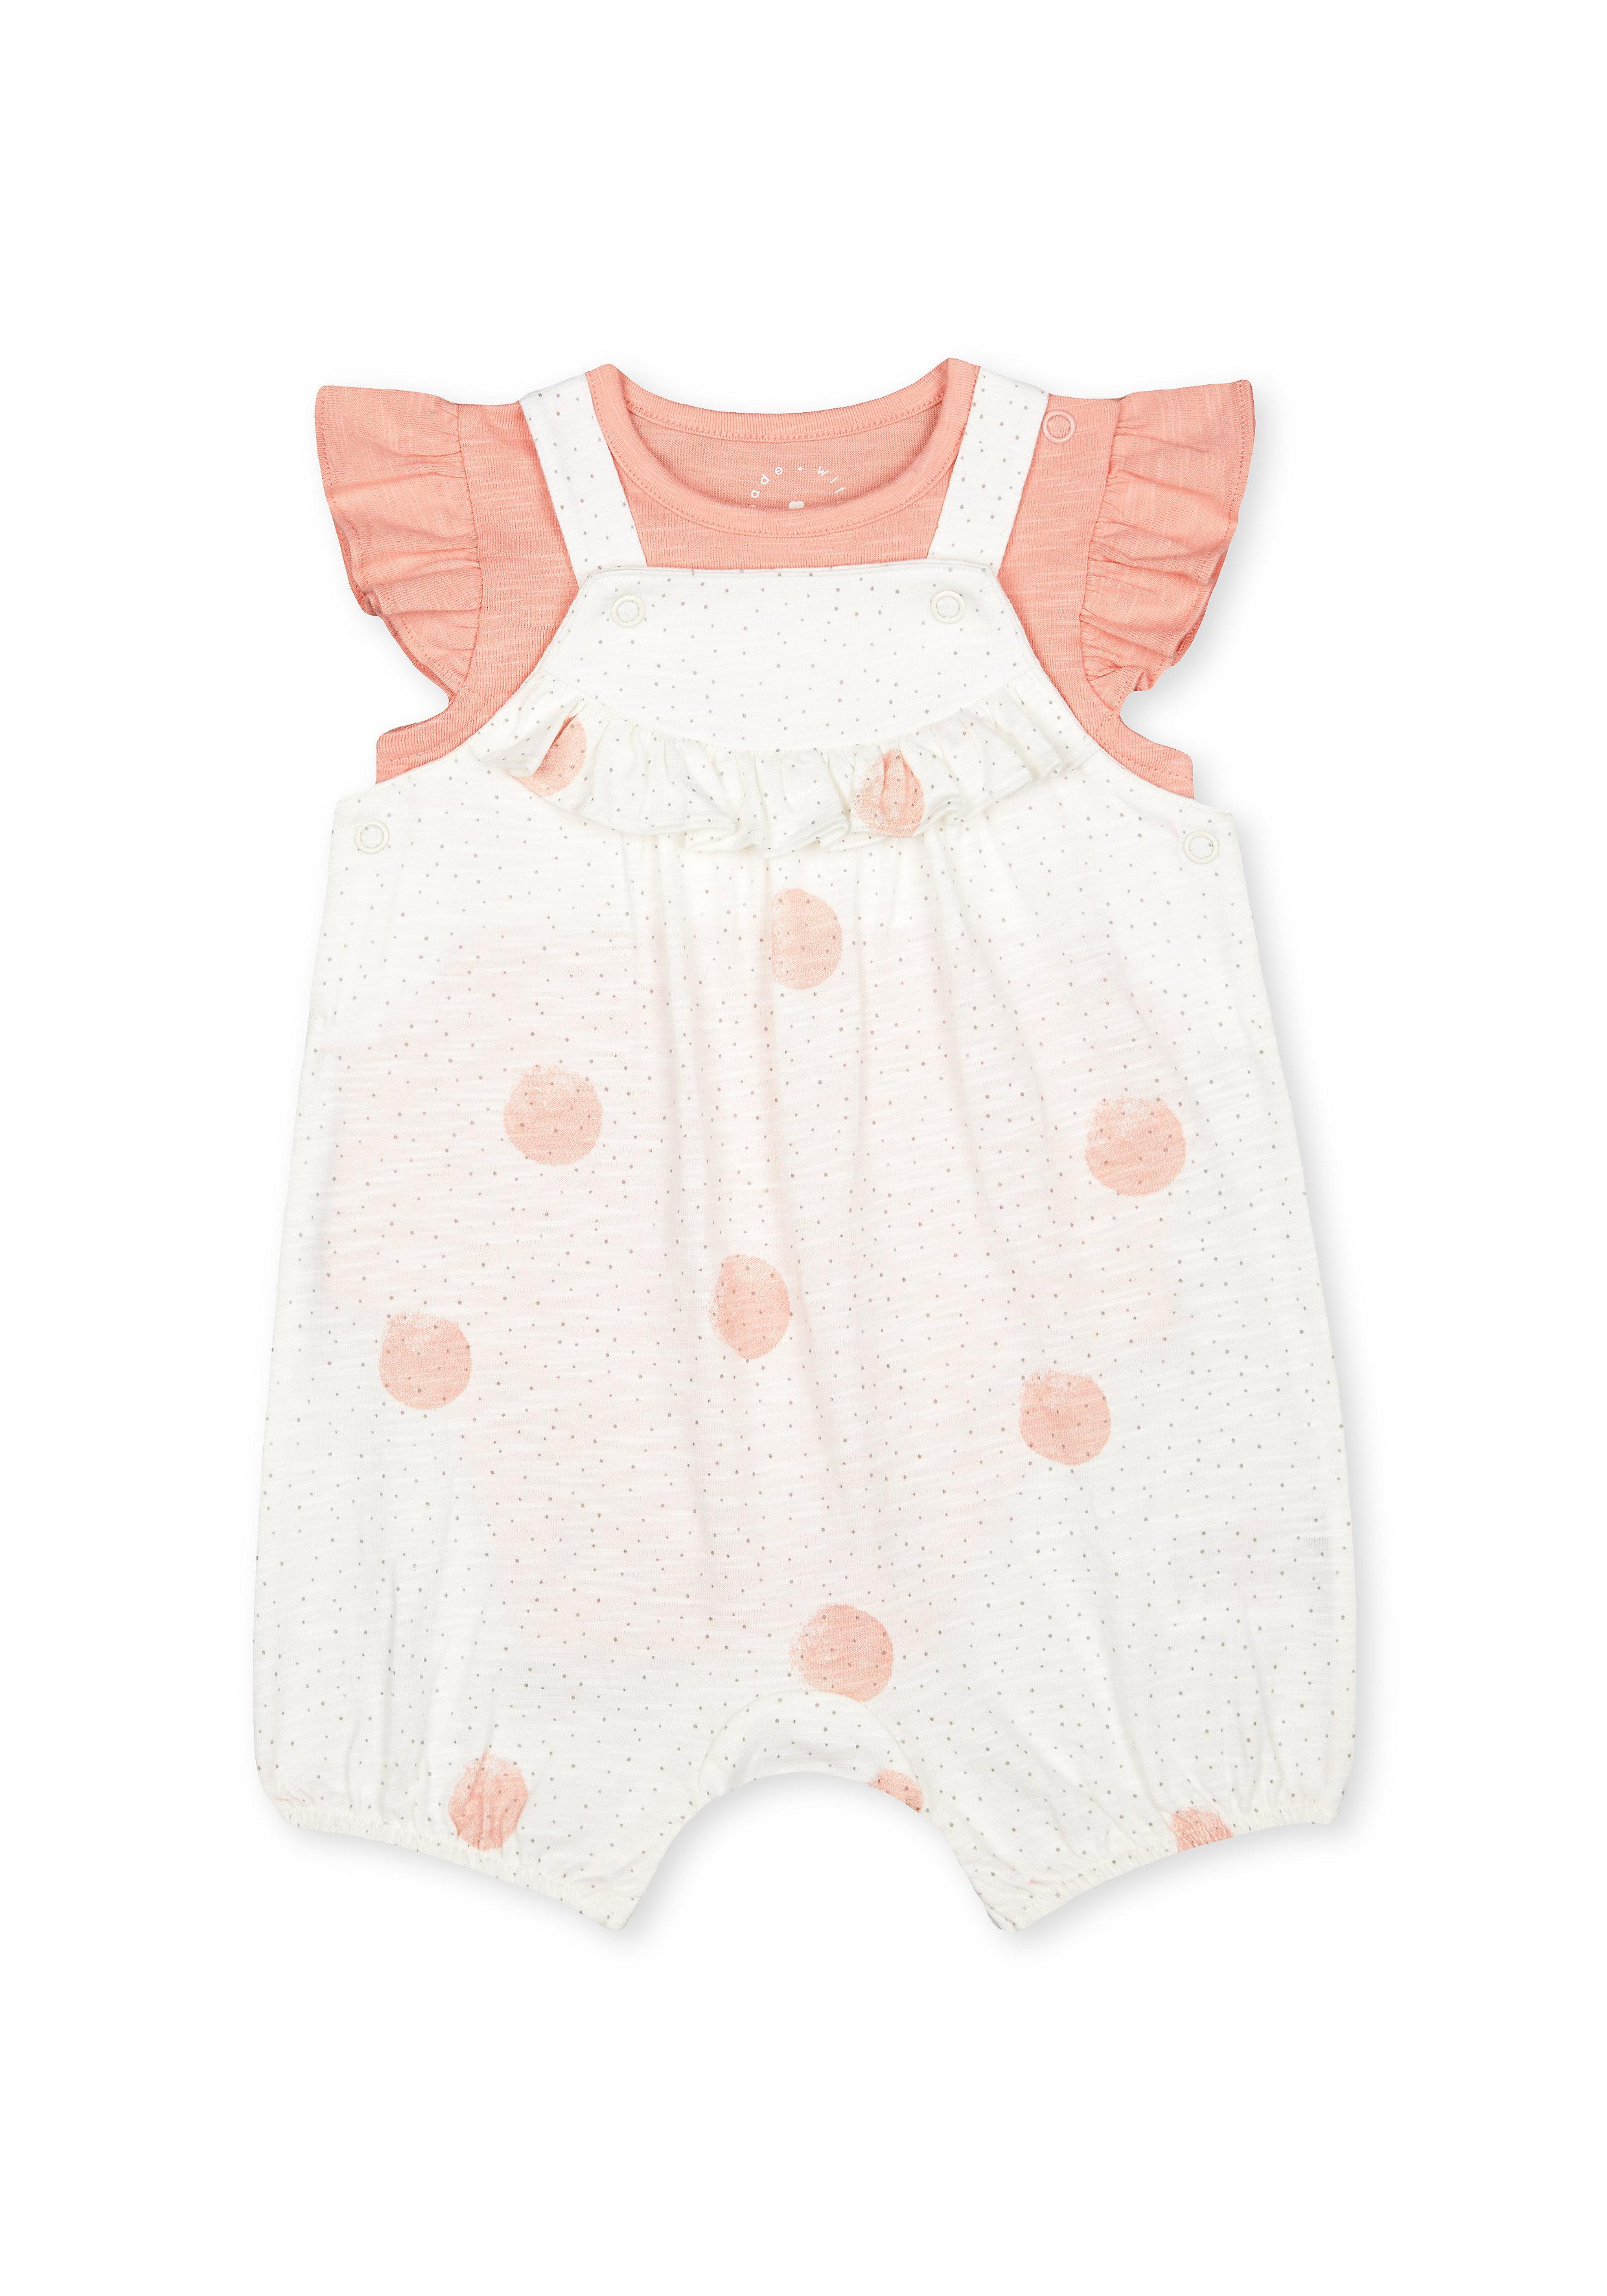 Mothercare   Girls Half Sleeves Dungaree Set Polka Dot Print - White Pink